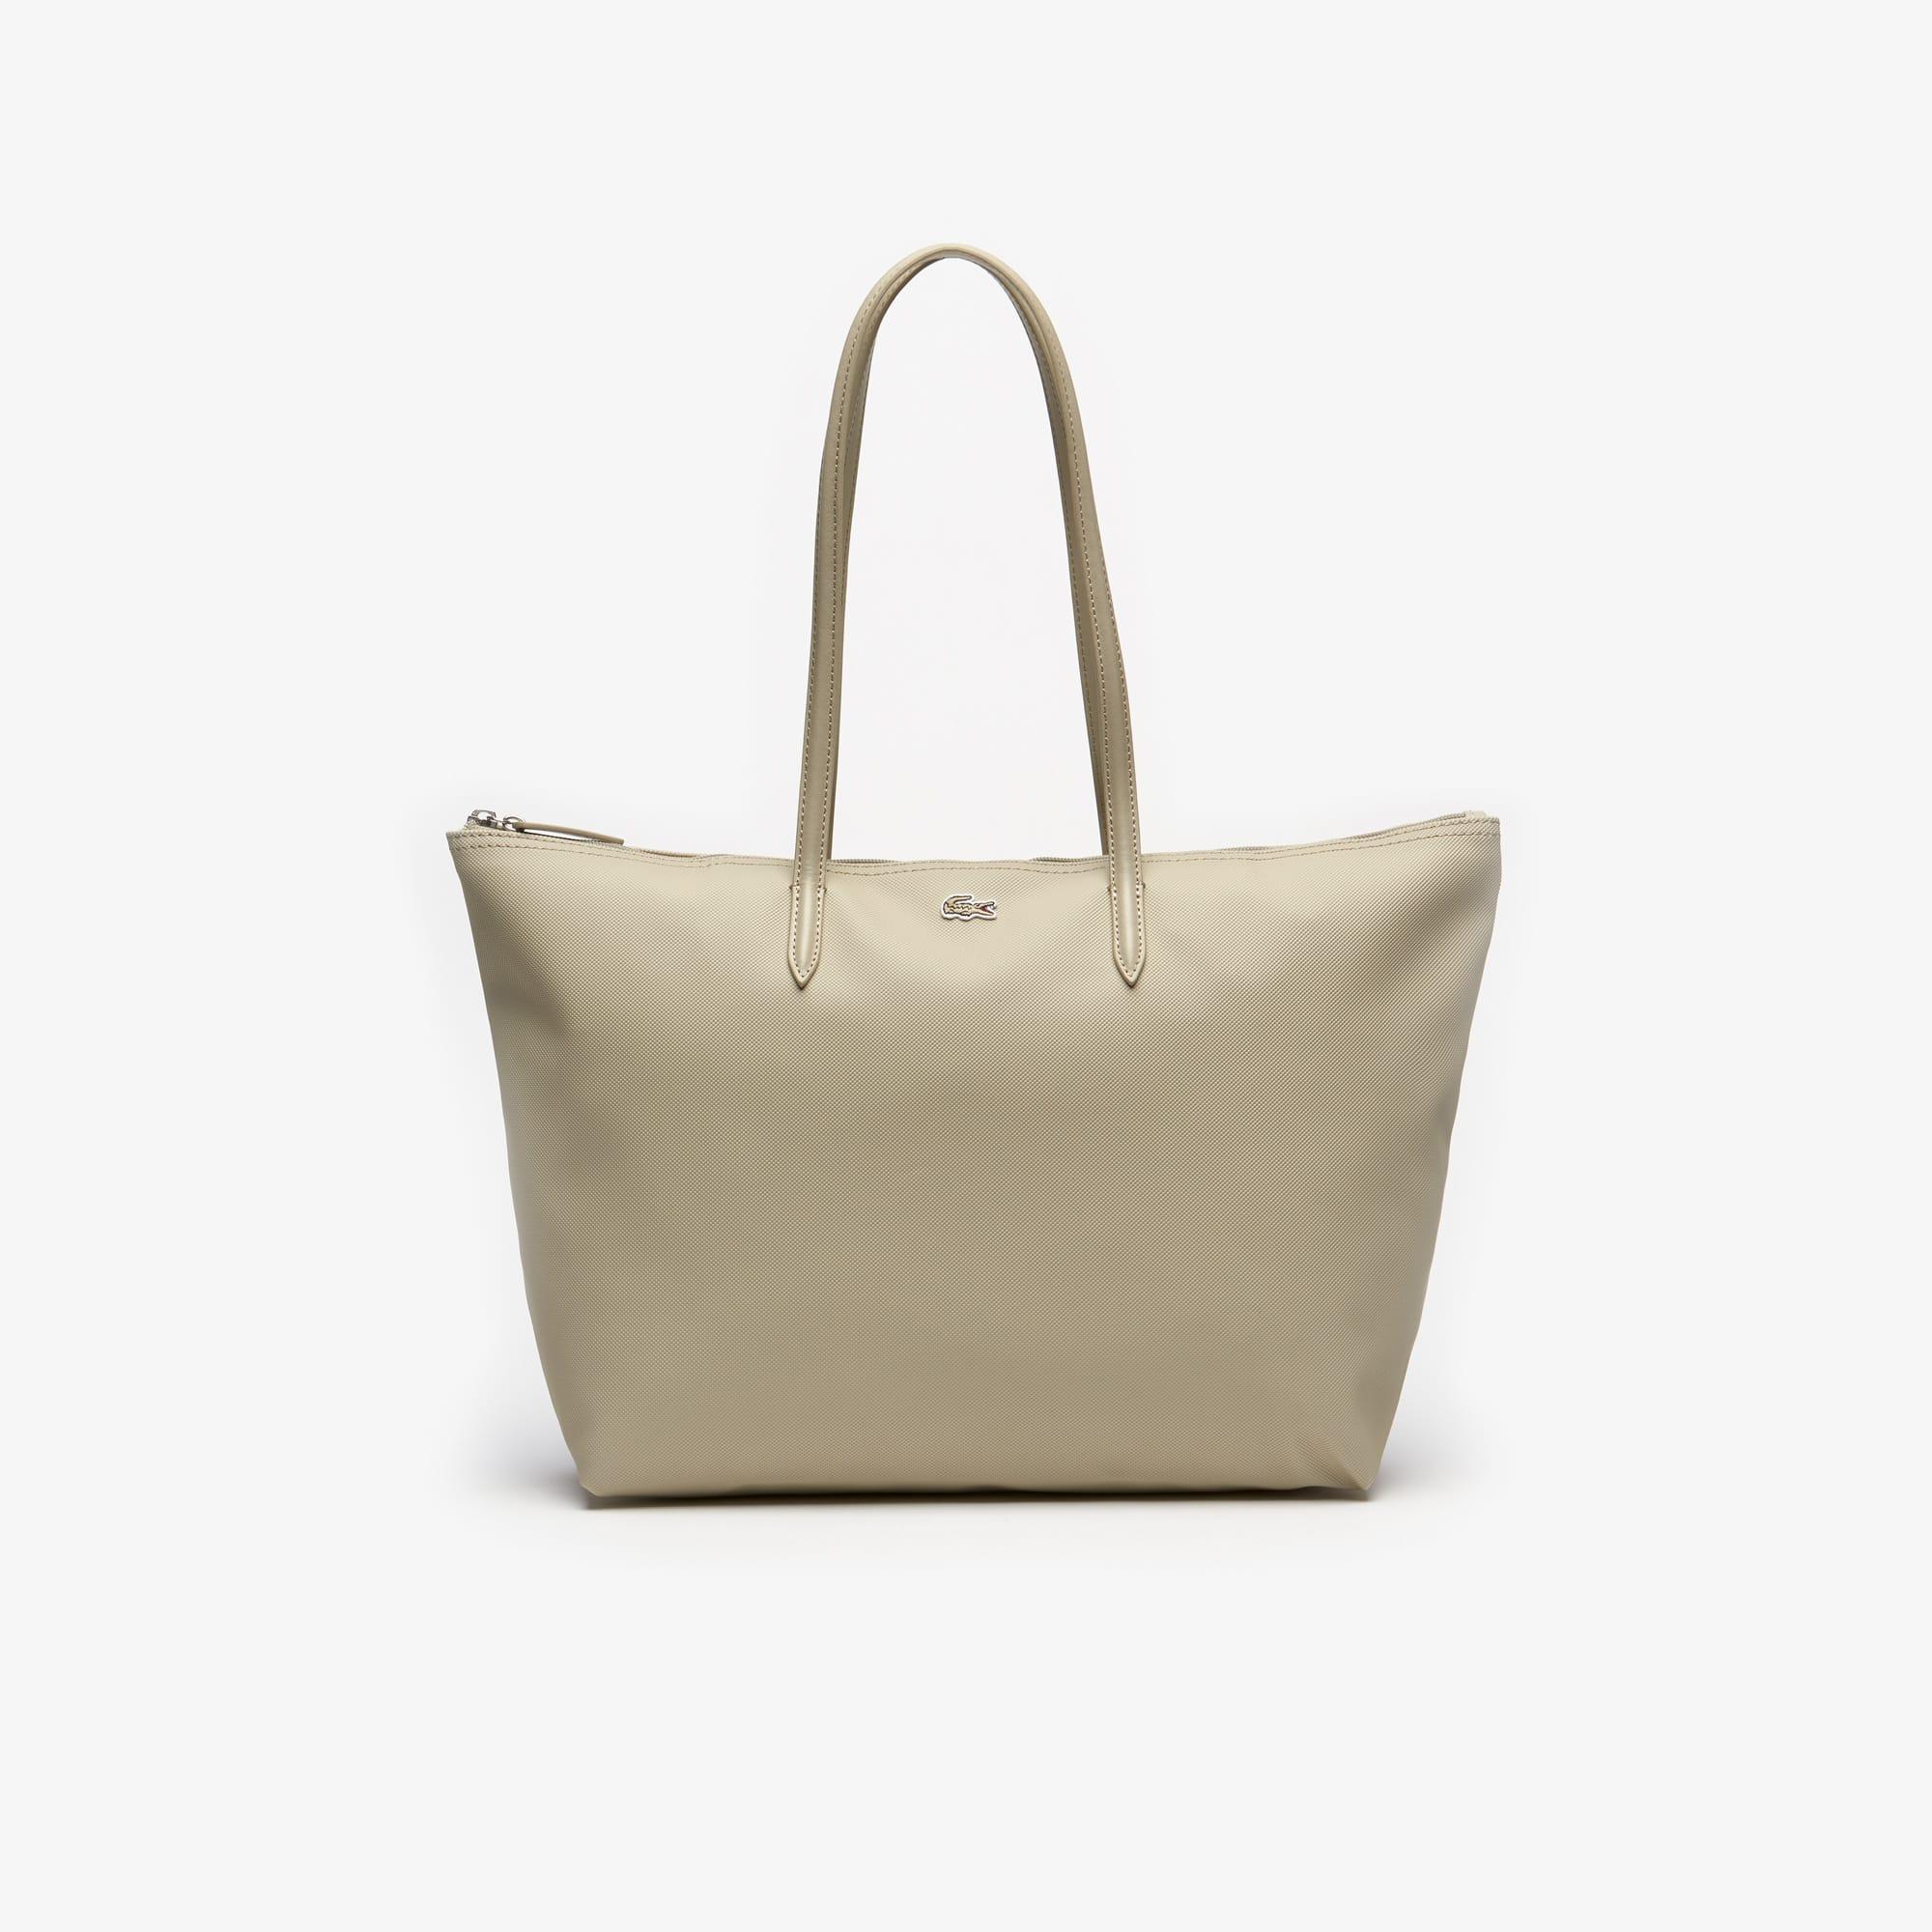 e540eea6f3 Sacs à main cuir, sacs cabas | Maroquinerie femme | LACOSTE